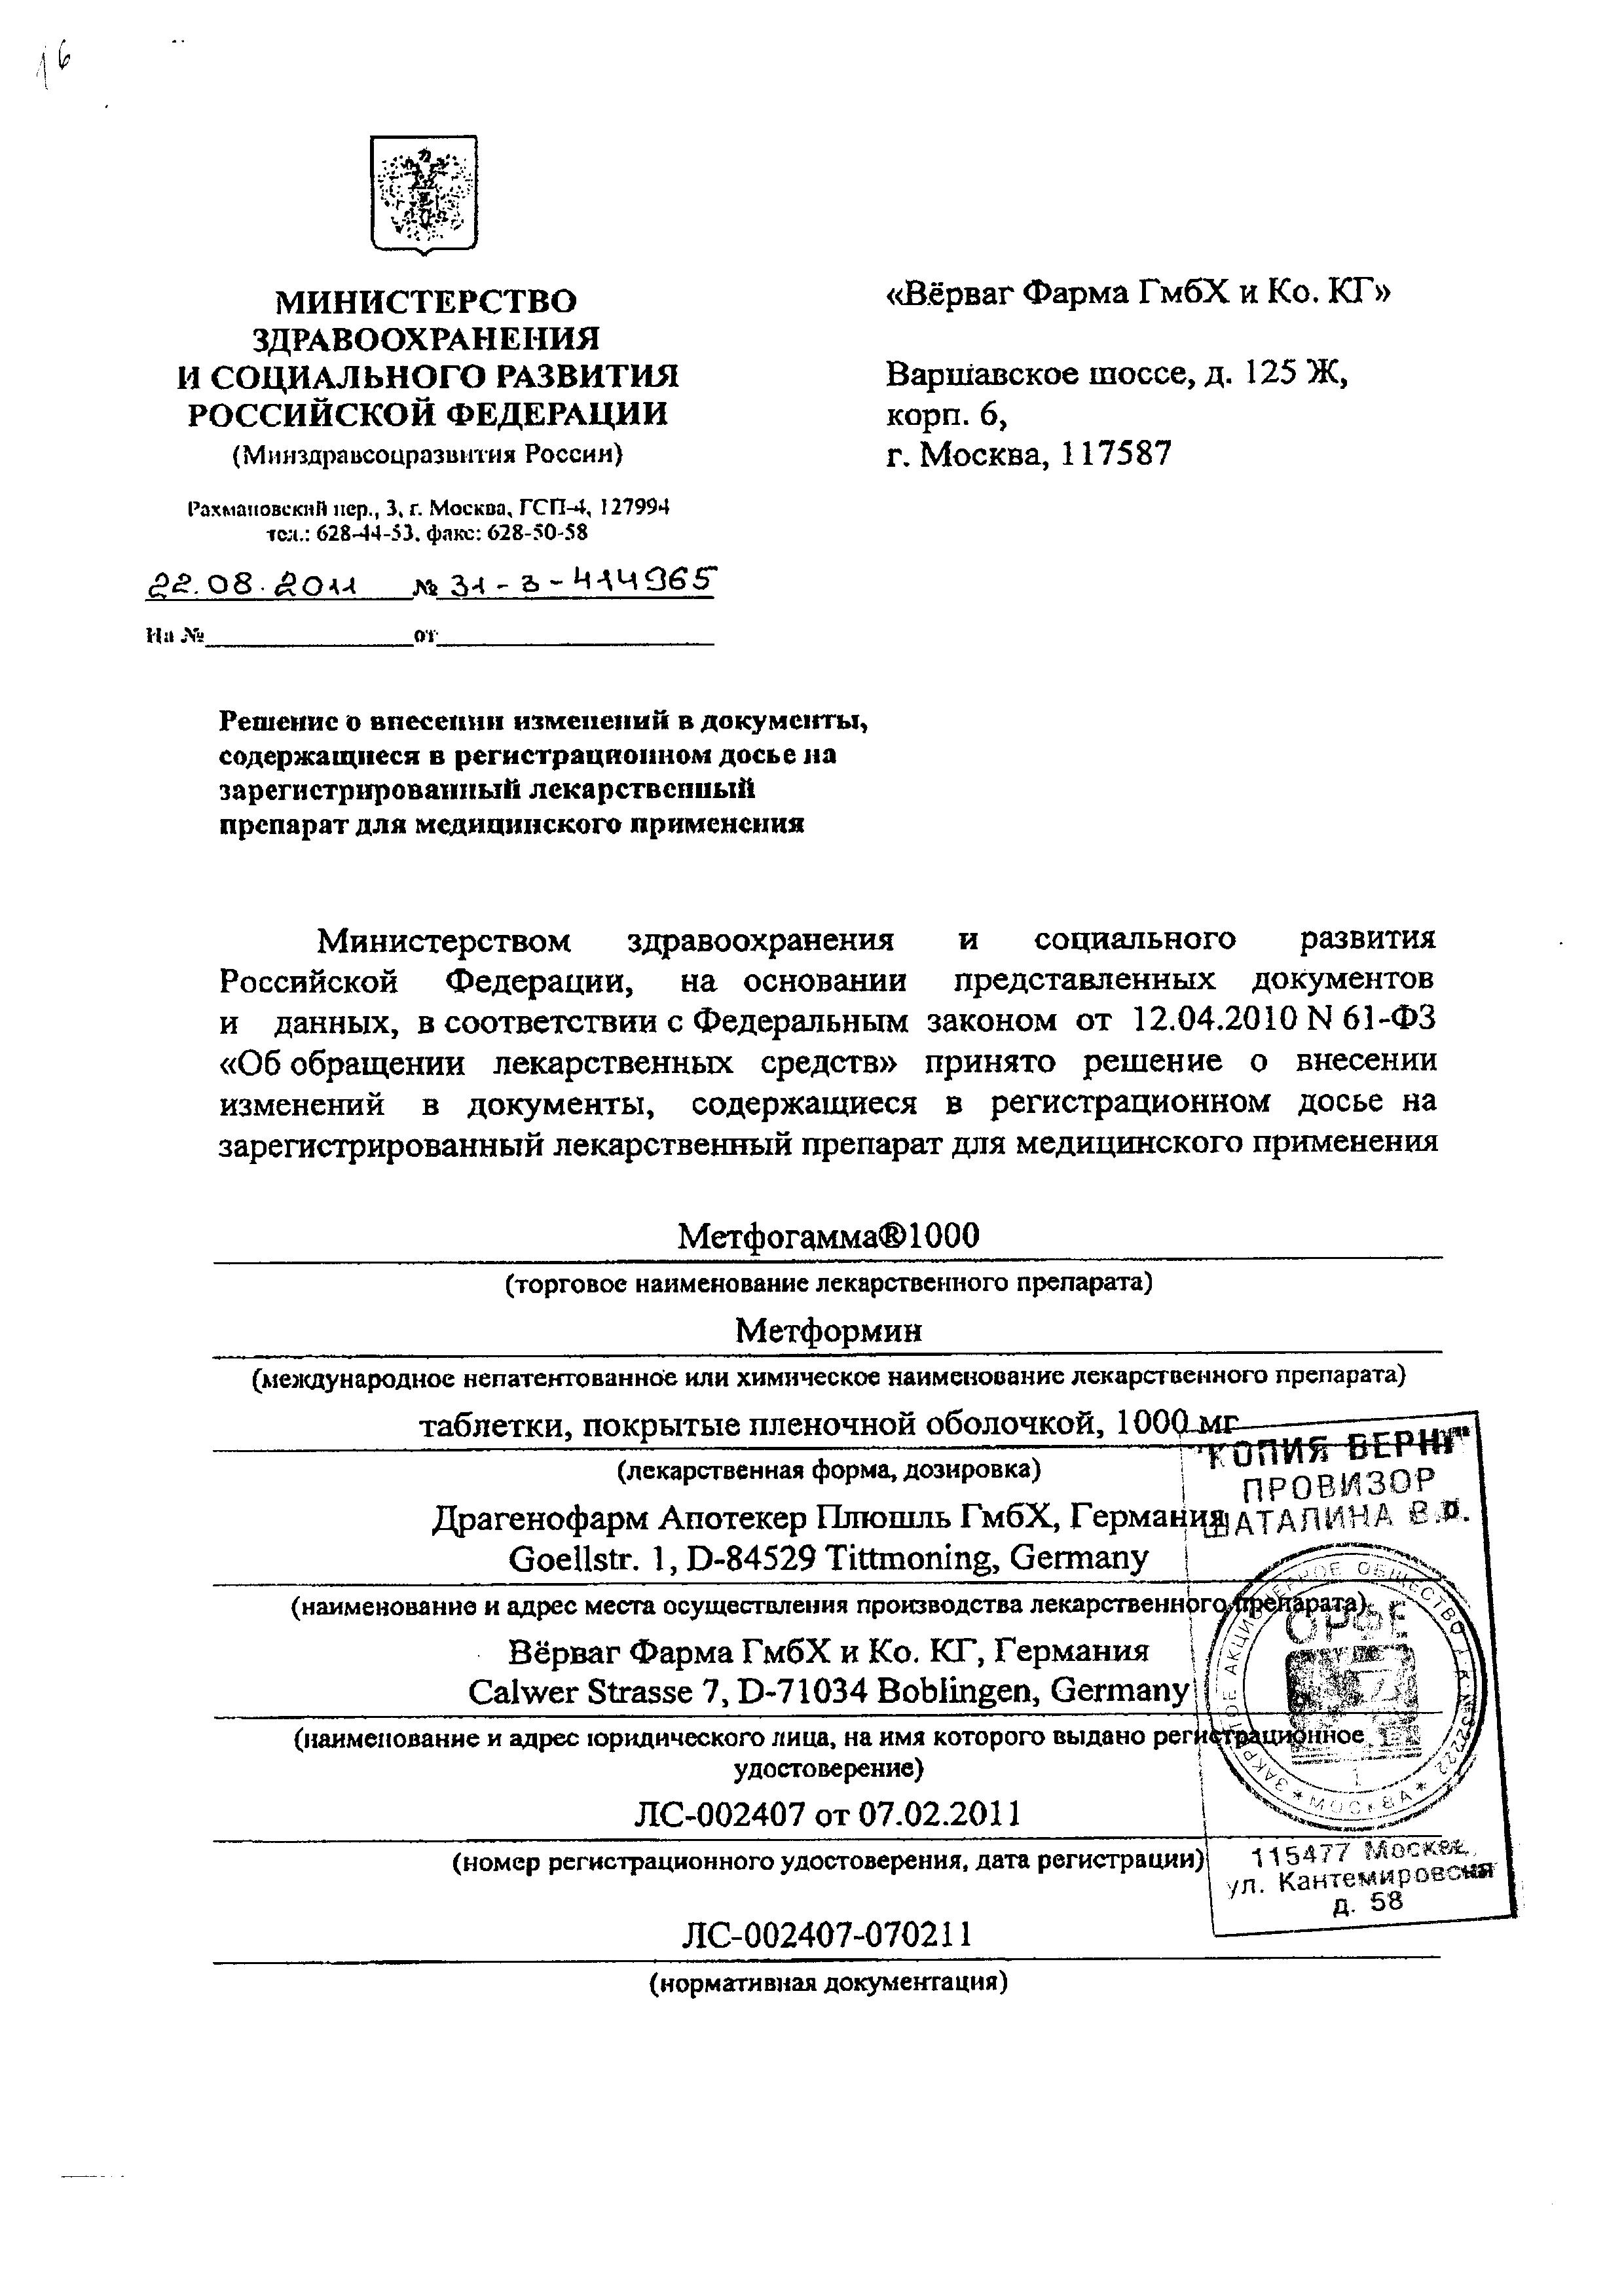 Метфогамма 1000 сертификат